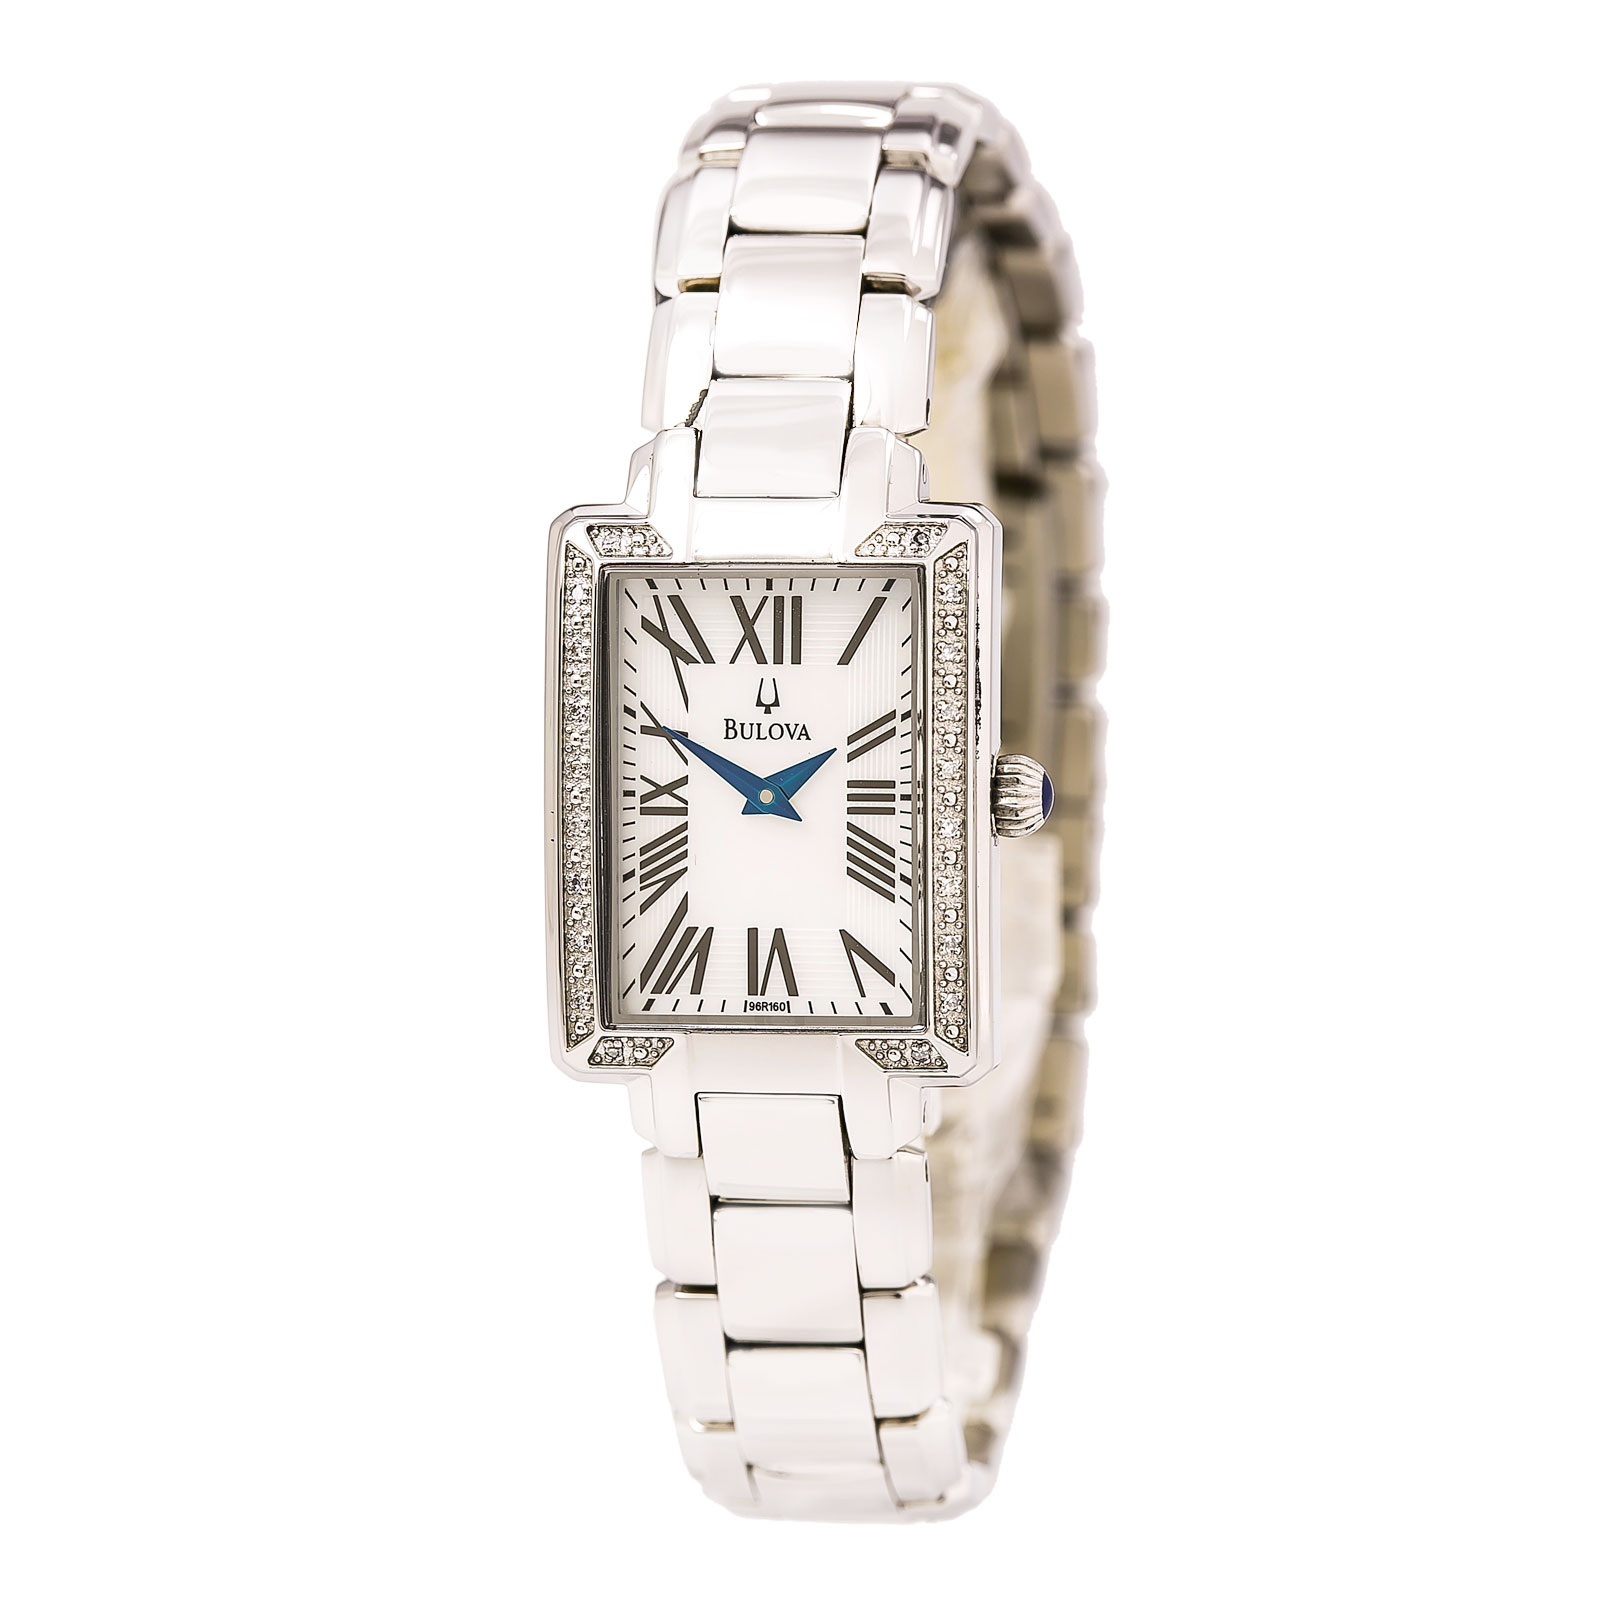 Bulova 96R160 Women's Fairlawn Diamond Accented Bezel White MOP Dial Stainless Steel Bracelet Watch